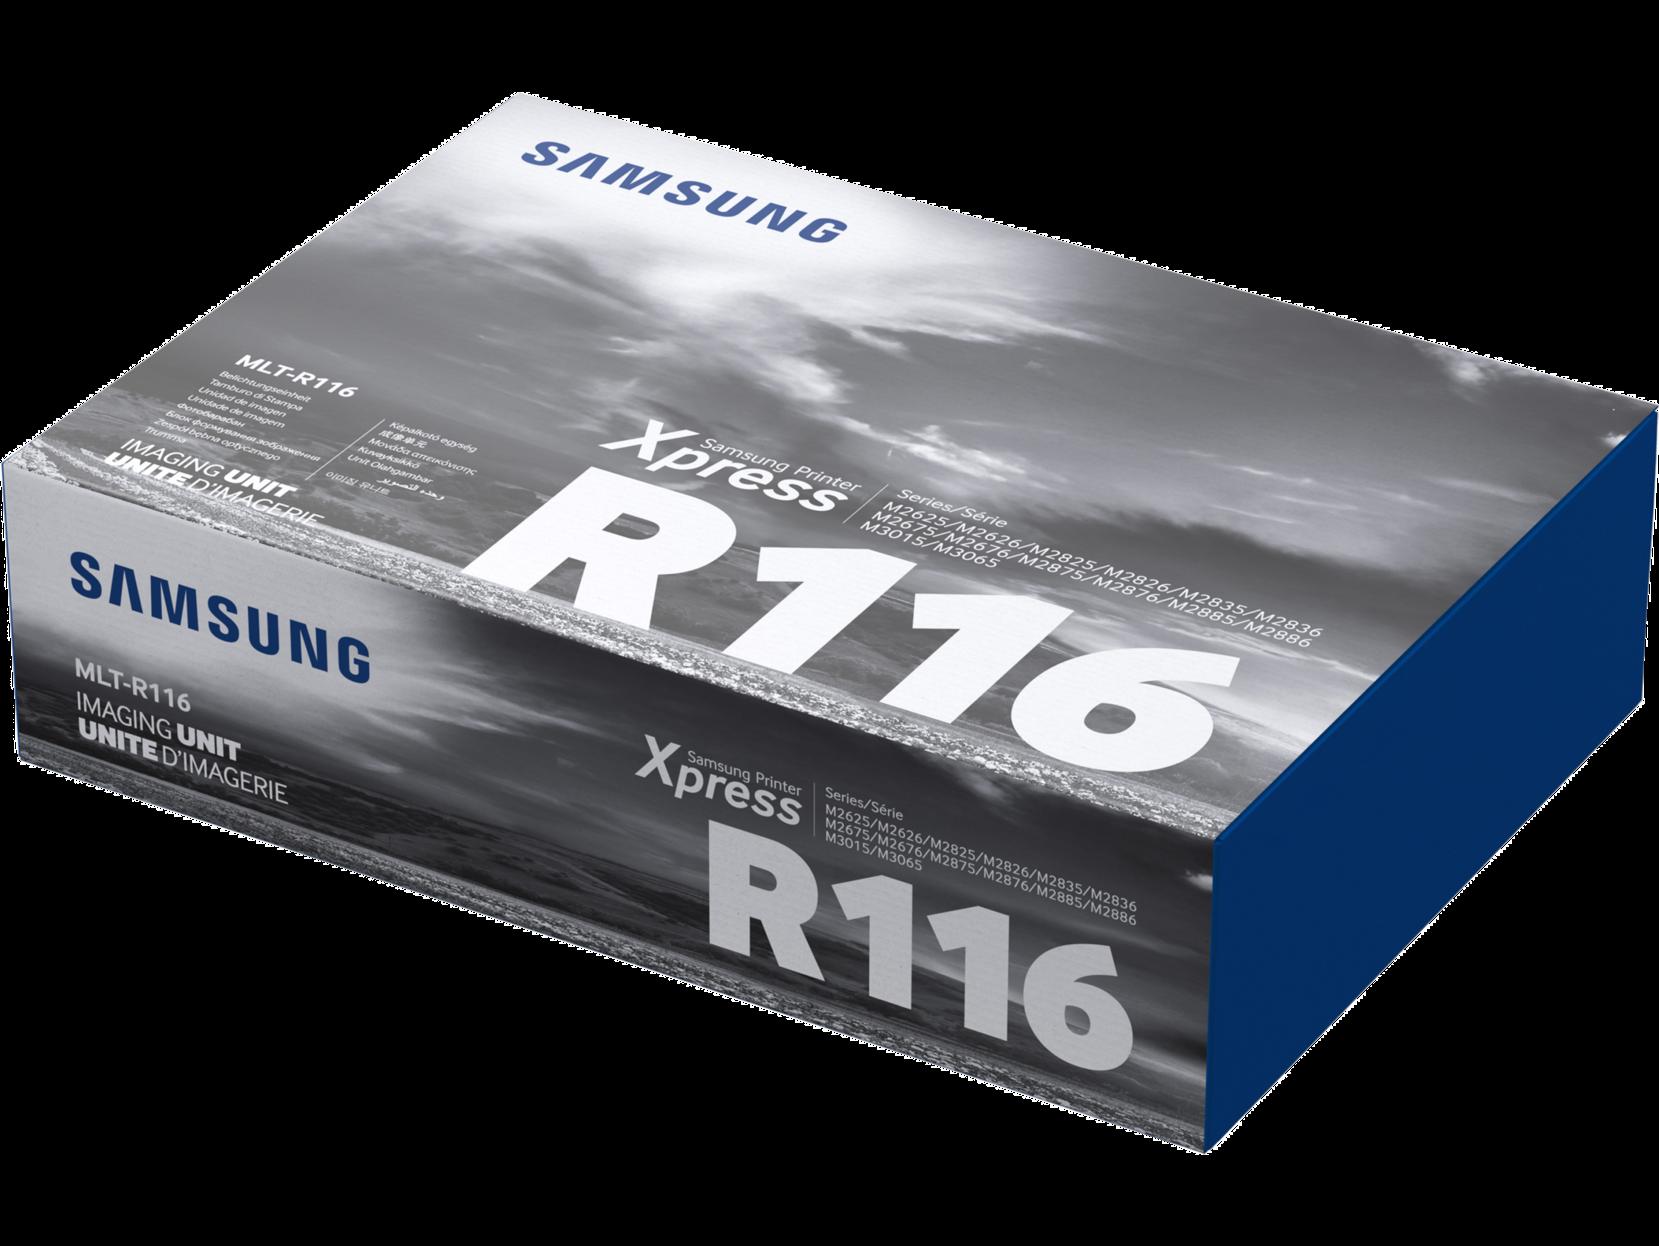 HP originální válec SV134A, MLT-R116/SEE, black, R116, imaging unit, 9000str., Samsung Xpress SL-M2625,2626,2825,2826,M2675,2676,2